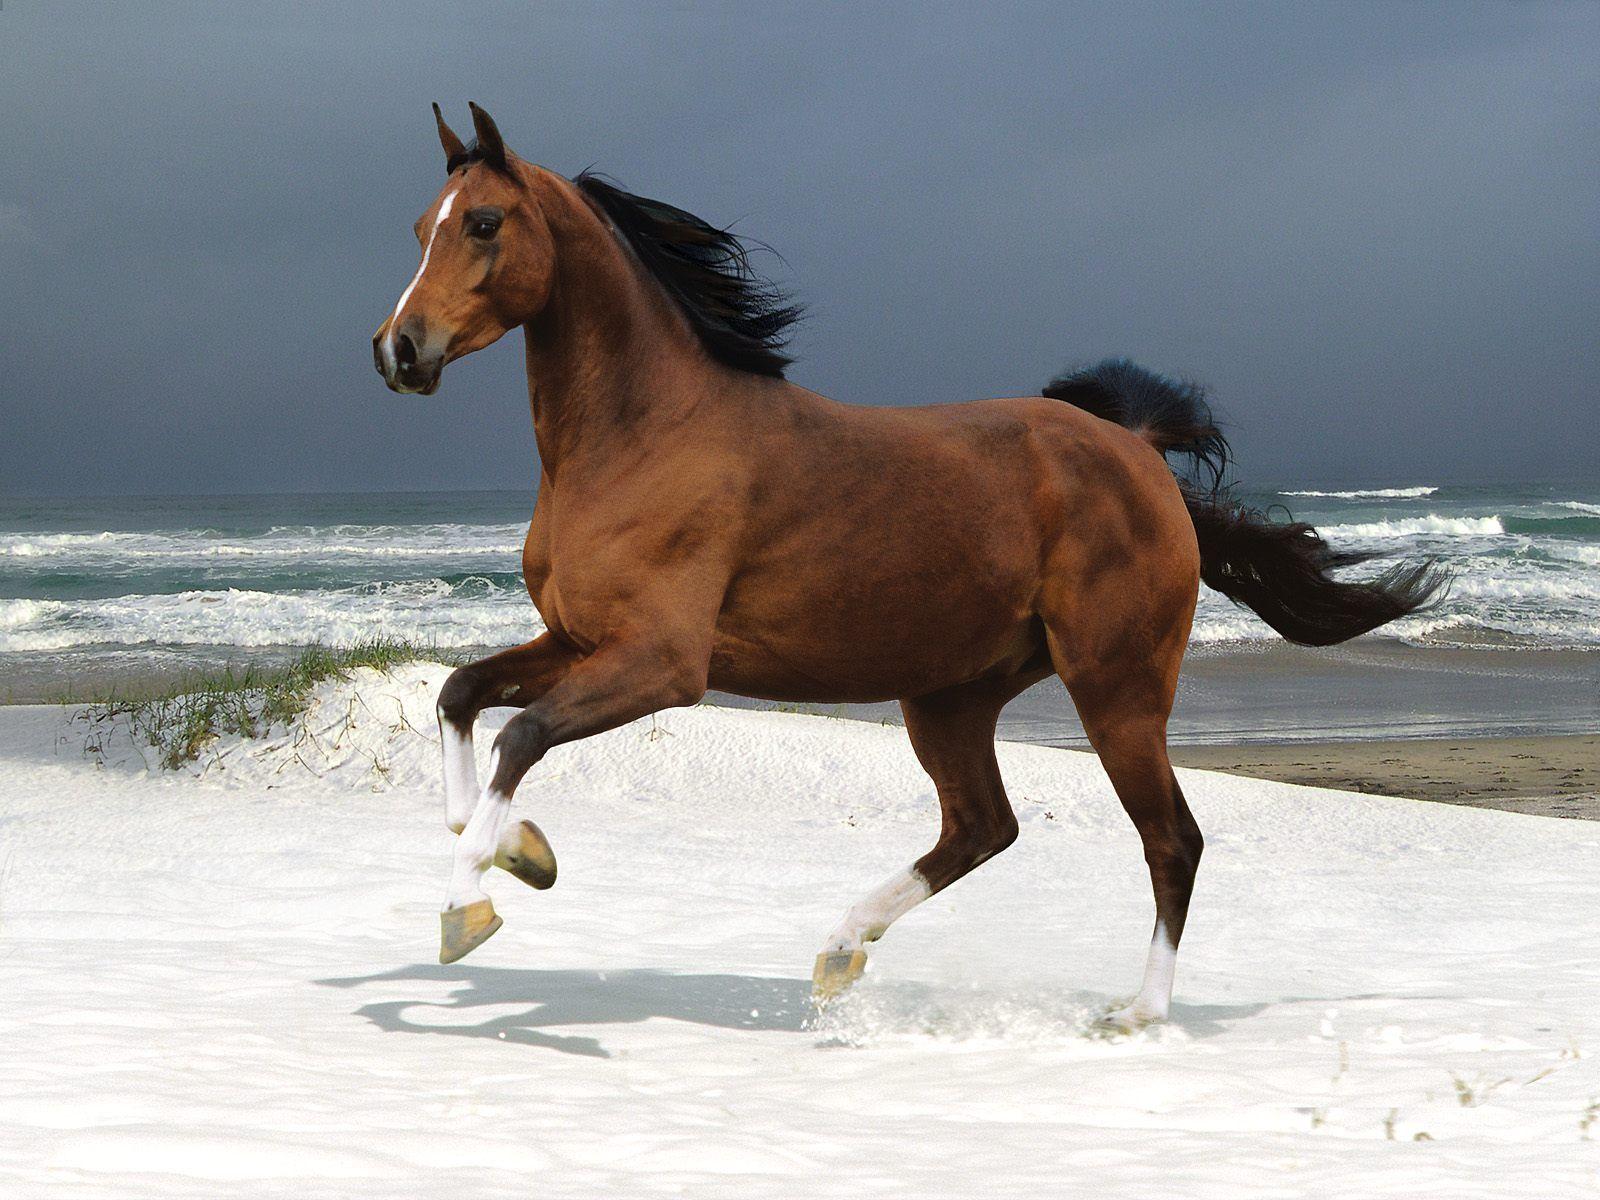 Cool Wallpaper Horse Beauty - 11fddb534c4a48827d3947385829c76c  Snapshot_3853.jpg